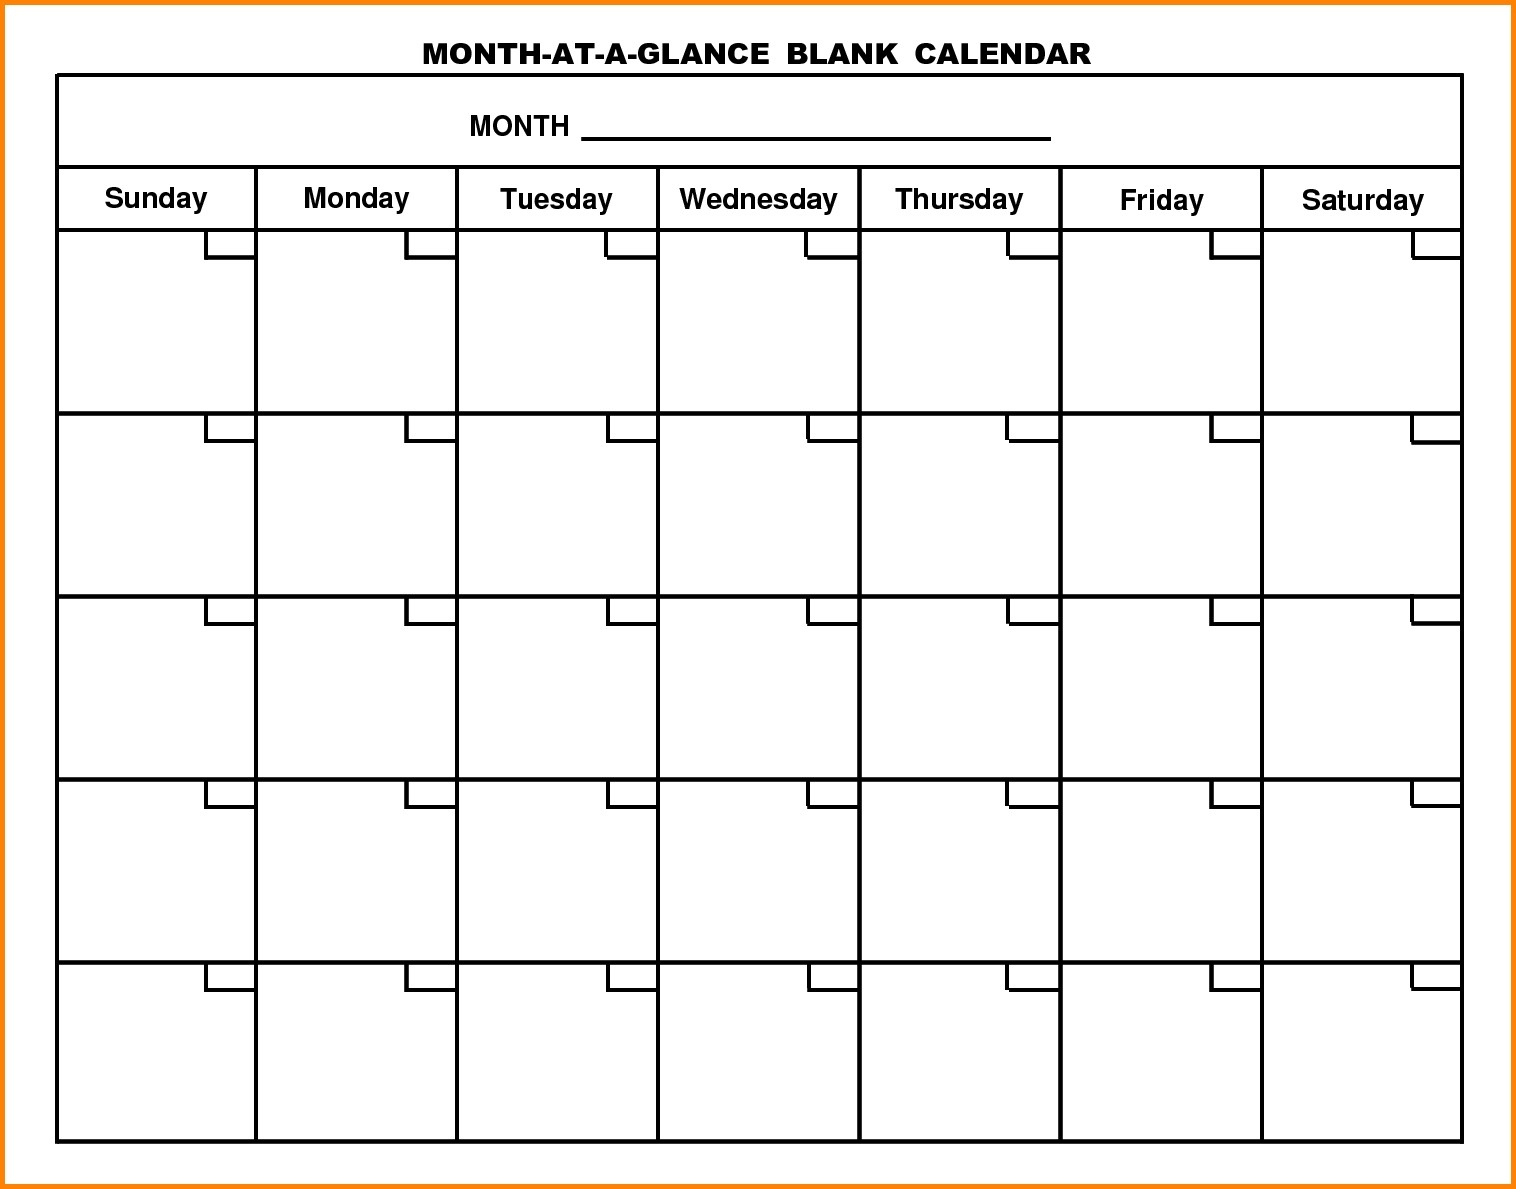 Month At A Glance Blank Calendar Printable   Monthly Inside Month At A Glance Blank Calendar Template